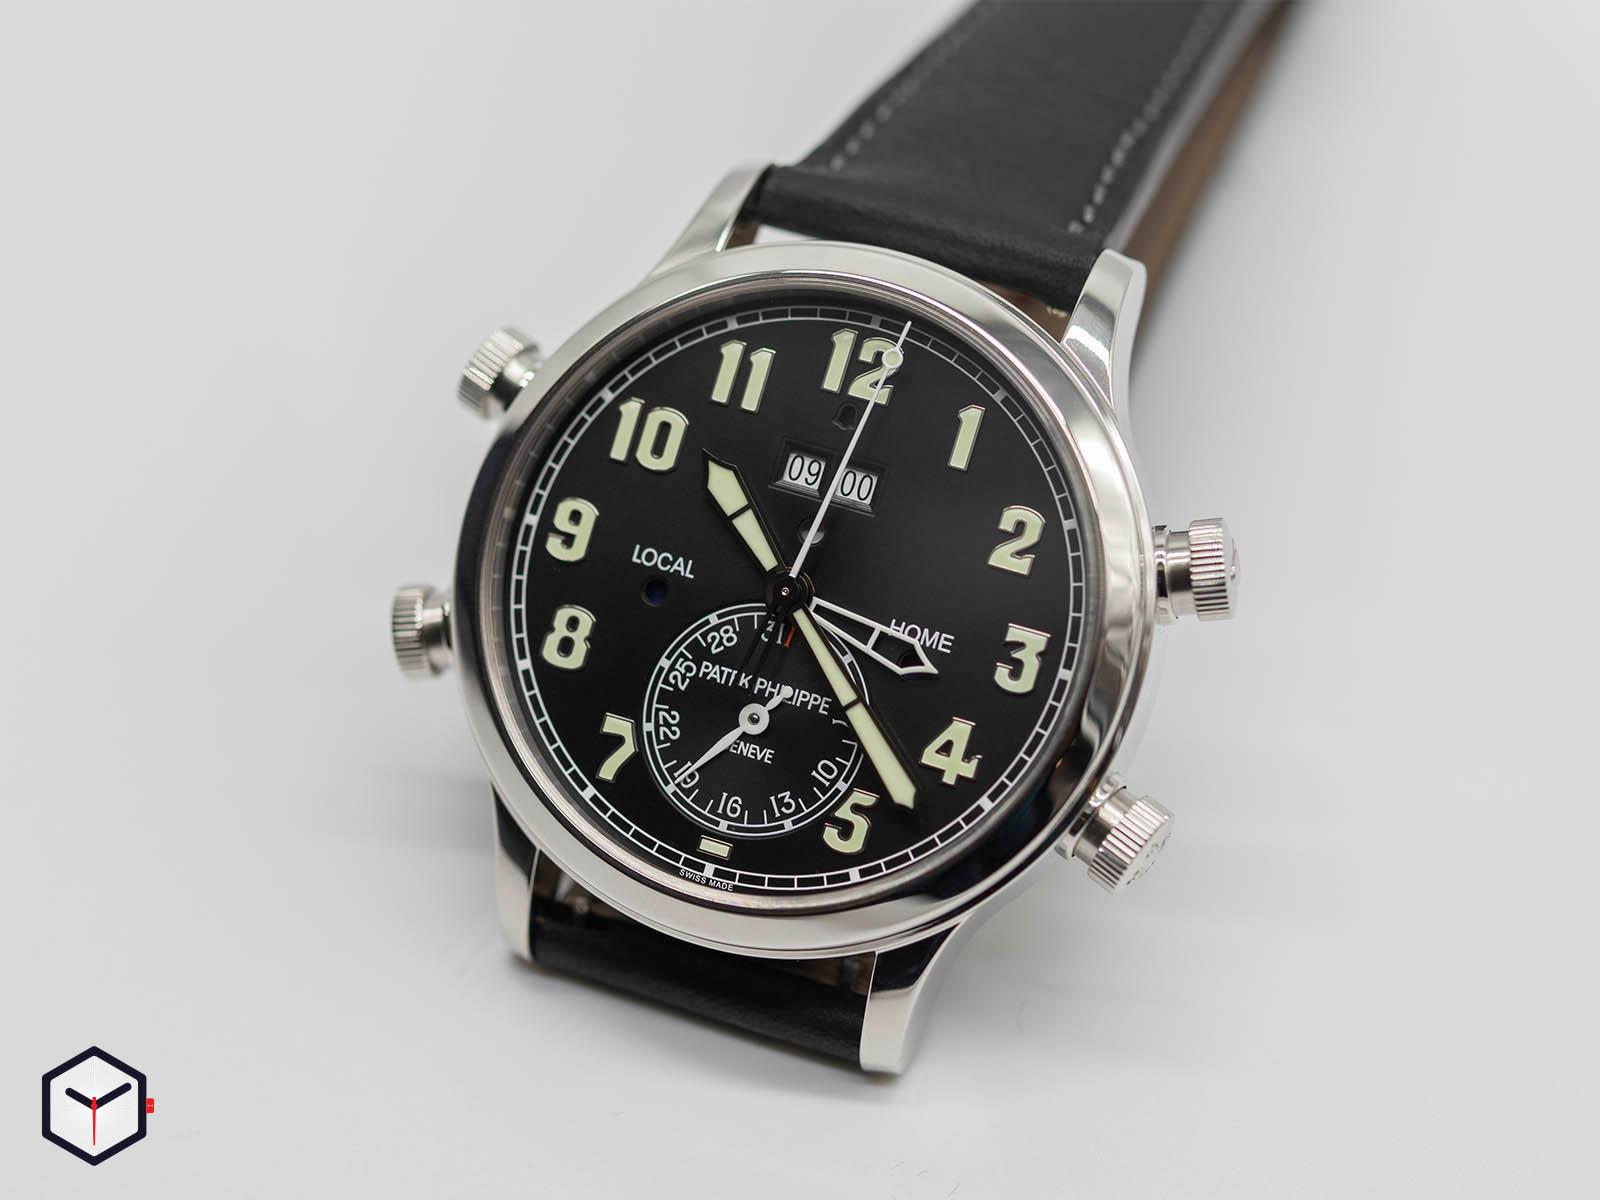 mechanical-alarm-watches-patek-philippe-5520p-1.jpg